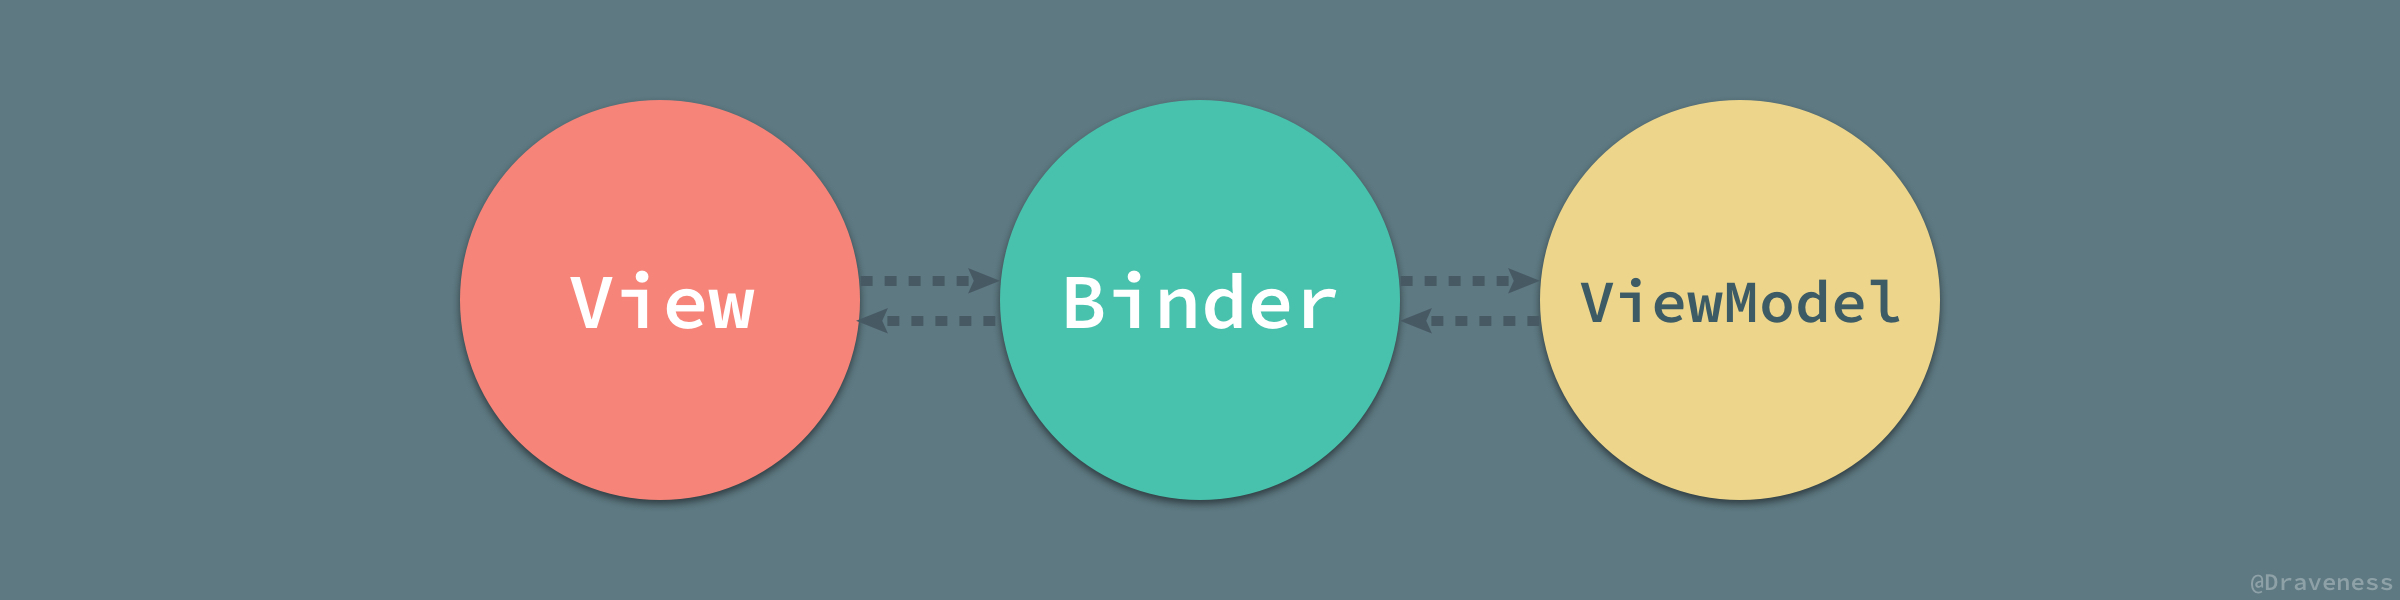 Binder-View-ViewModel